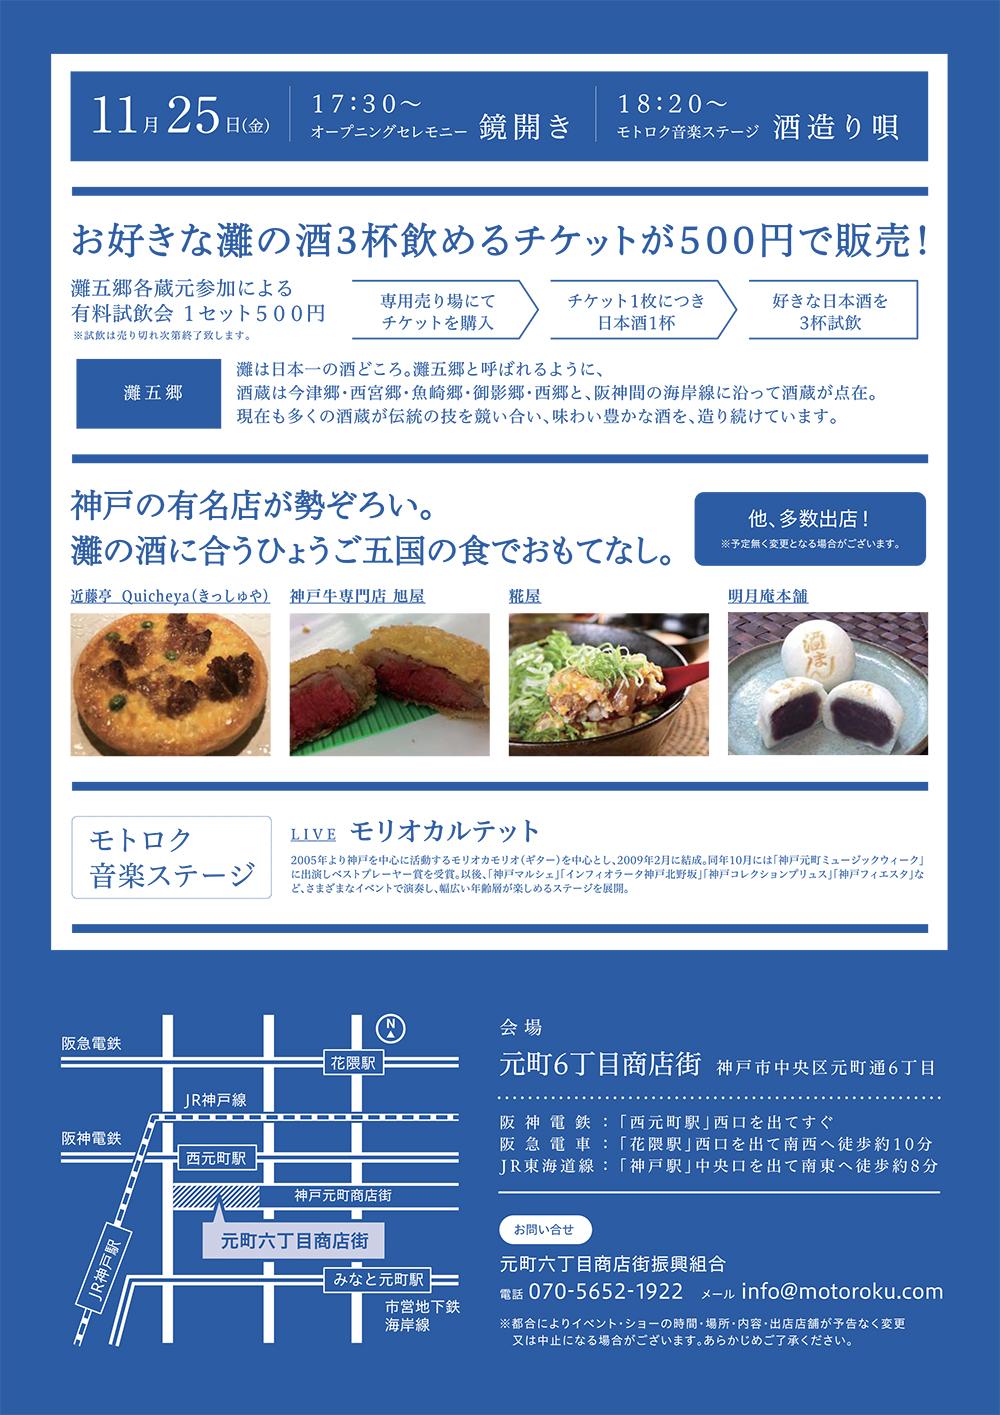 http://www.hakushika.co.jp/topics/images/motoroku2016_2.jpg